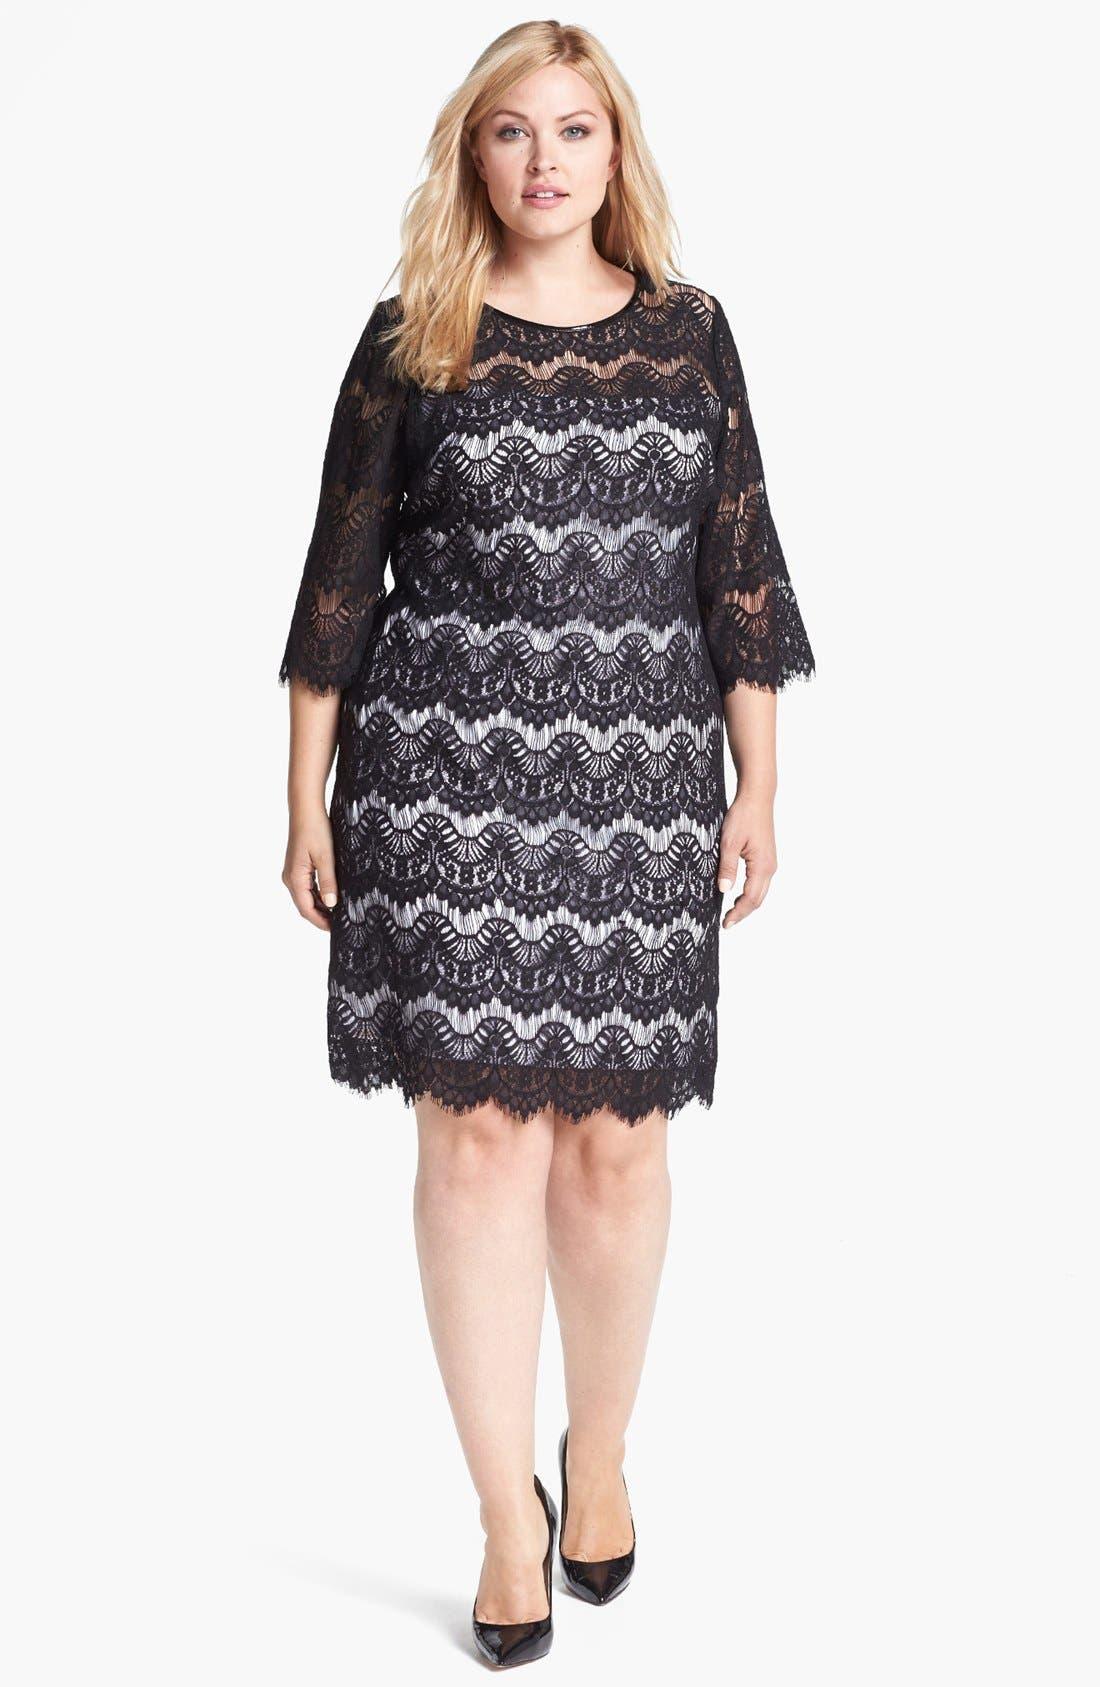 Alternate Image 1 Selected - Calvin Klein Faux Leather Trim Lace Dress (Plus Size)